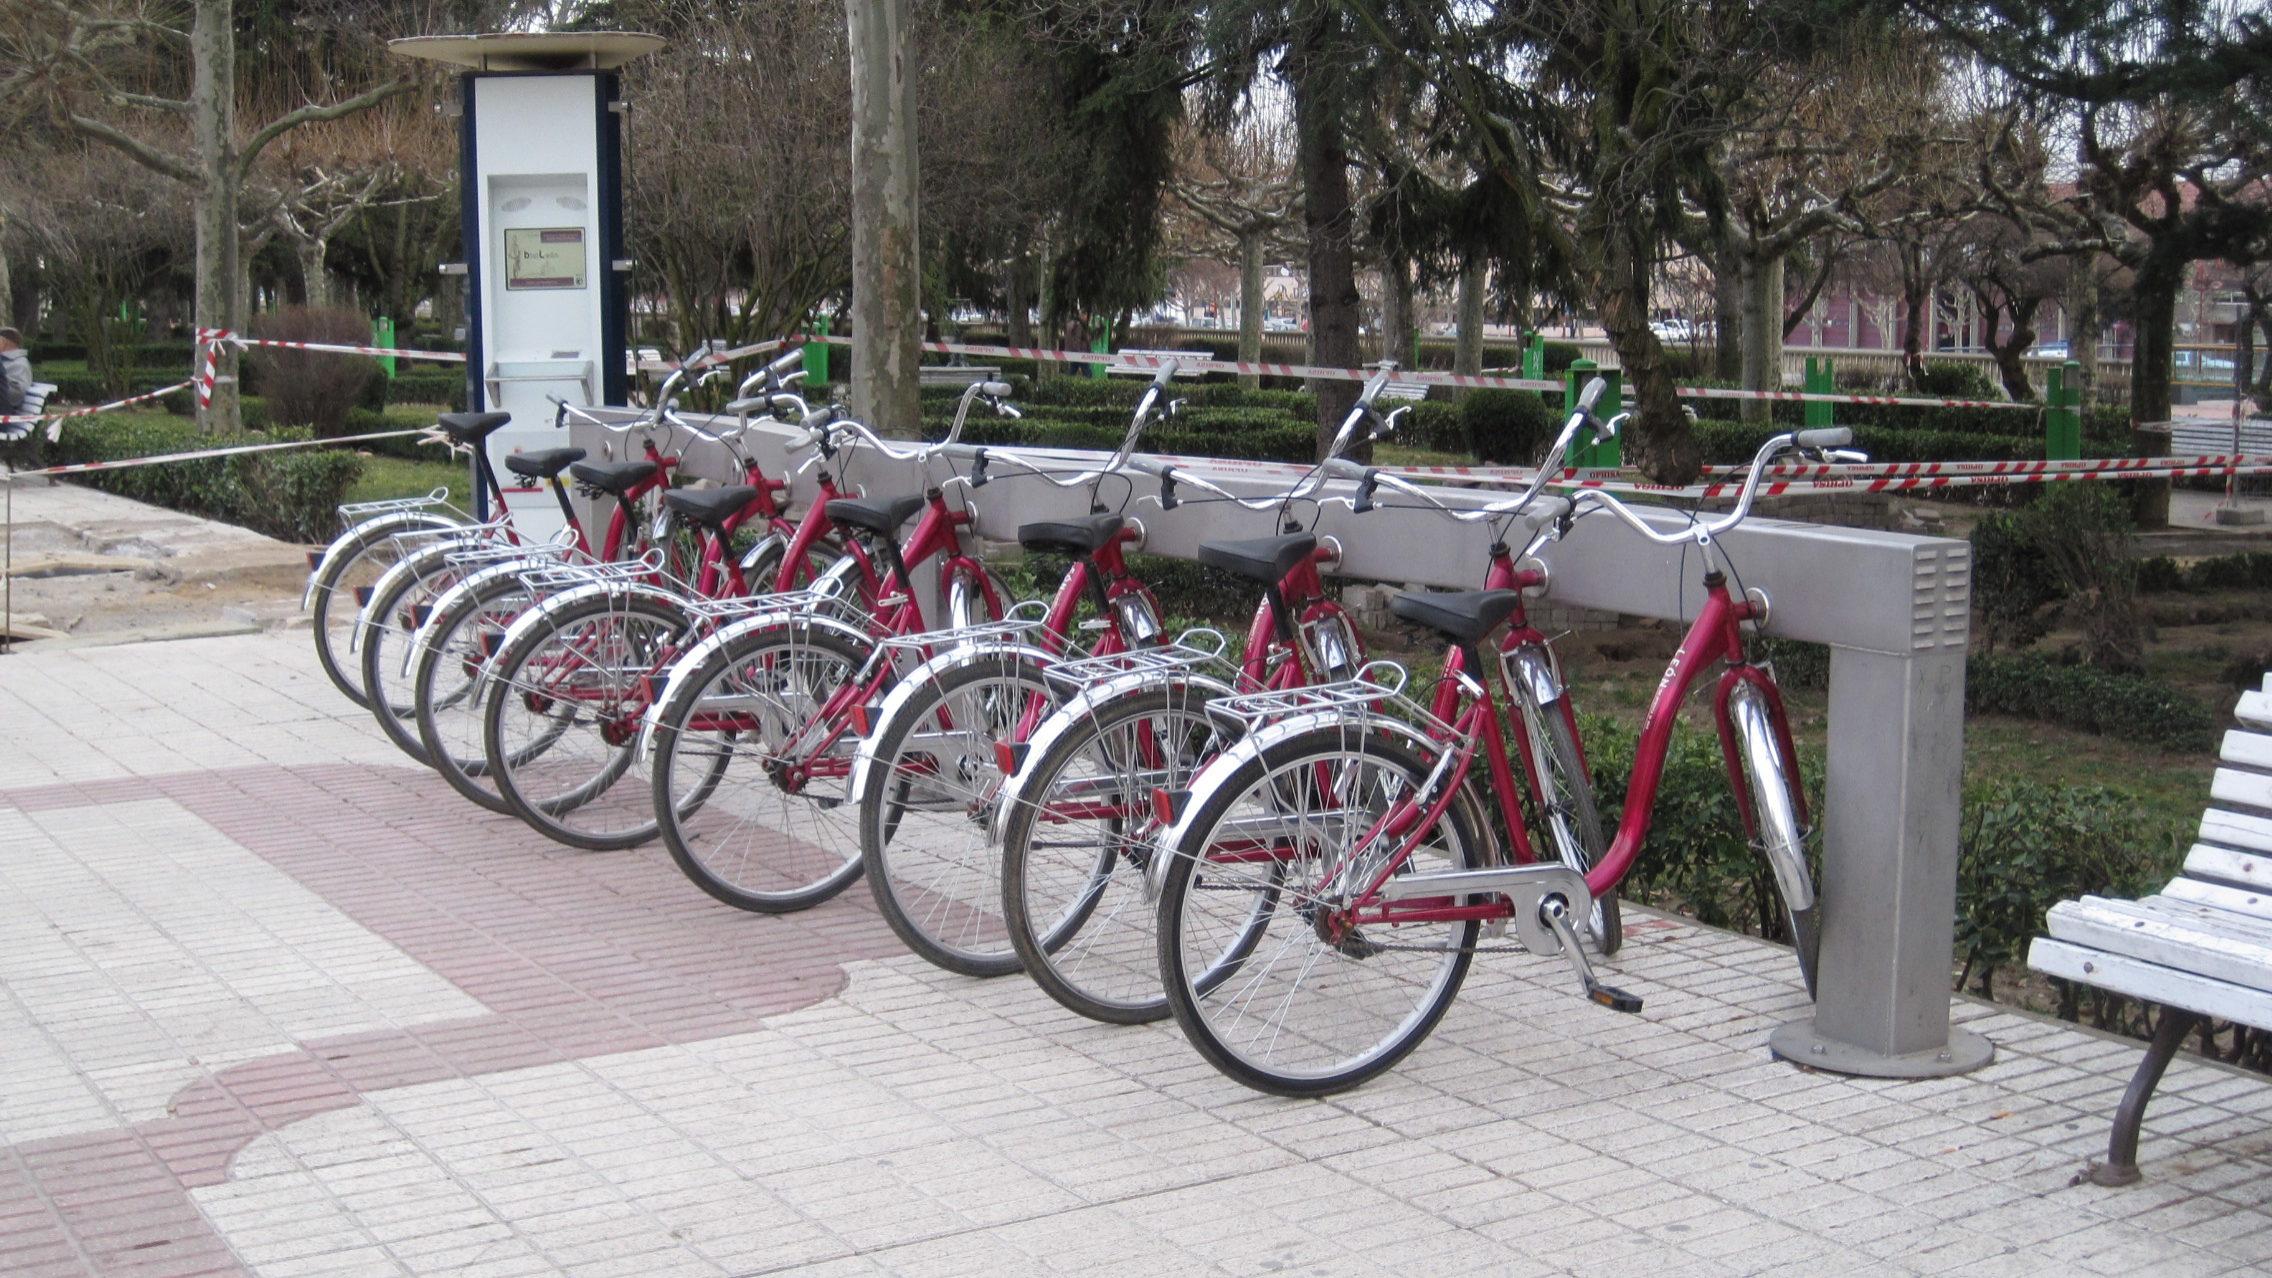 Governo limita 'carsharing' e 'bikesharing' a 12 horas e 100 km